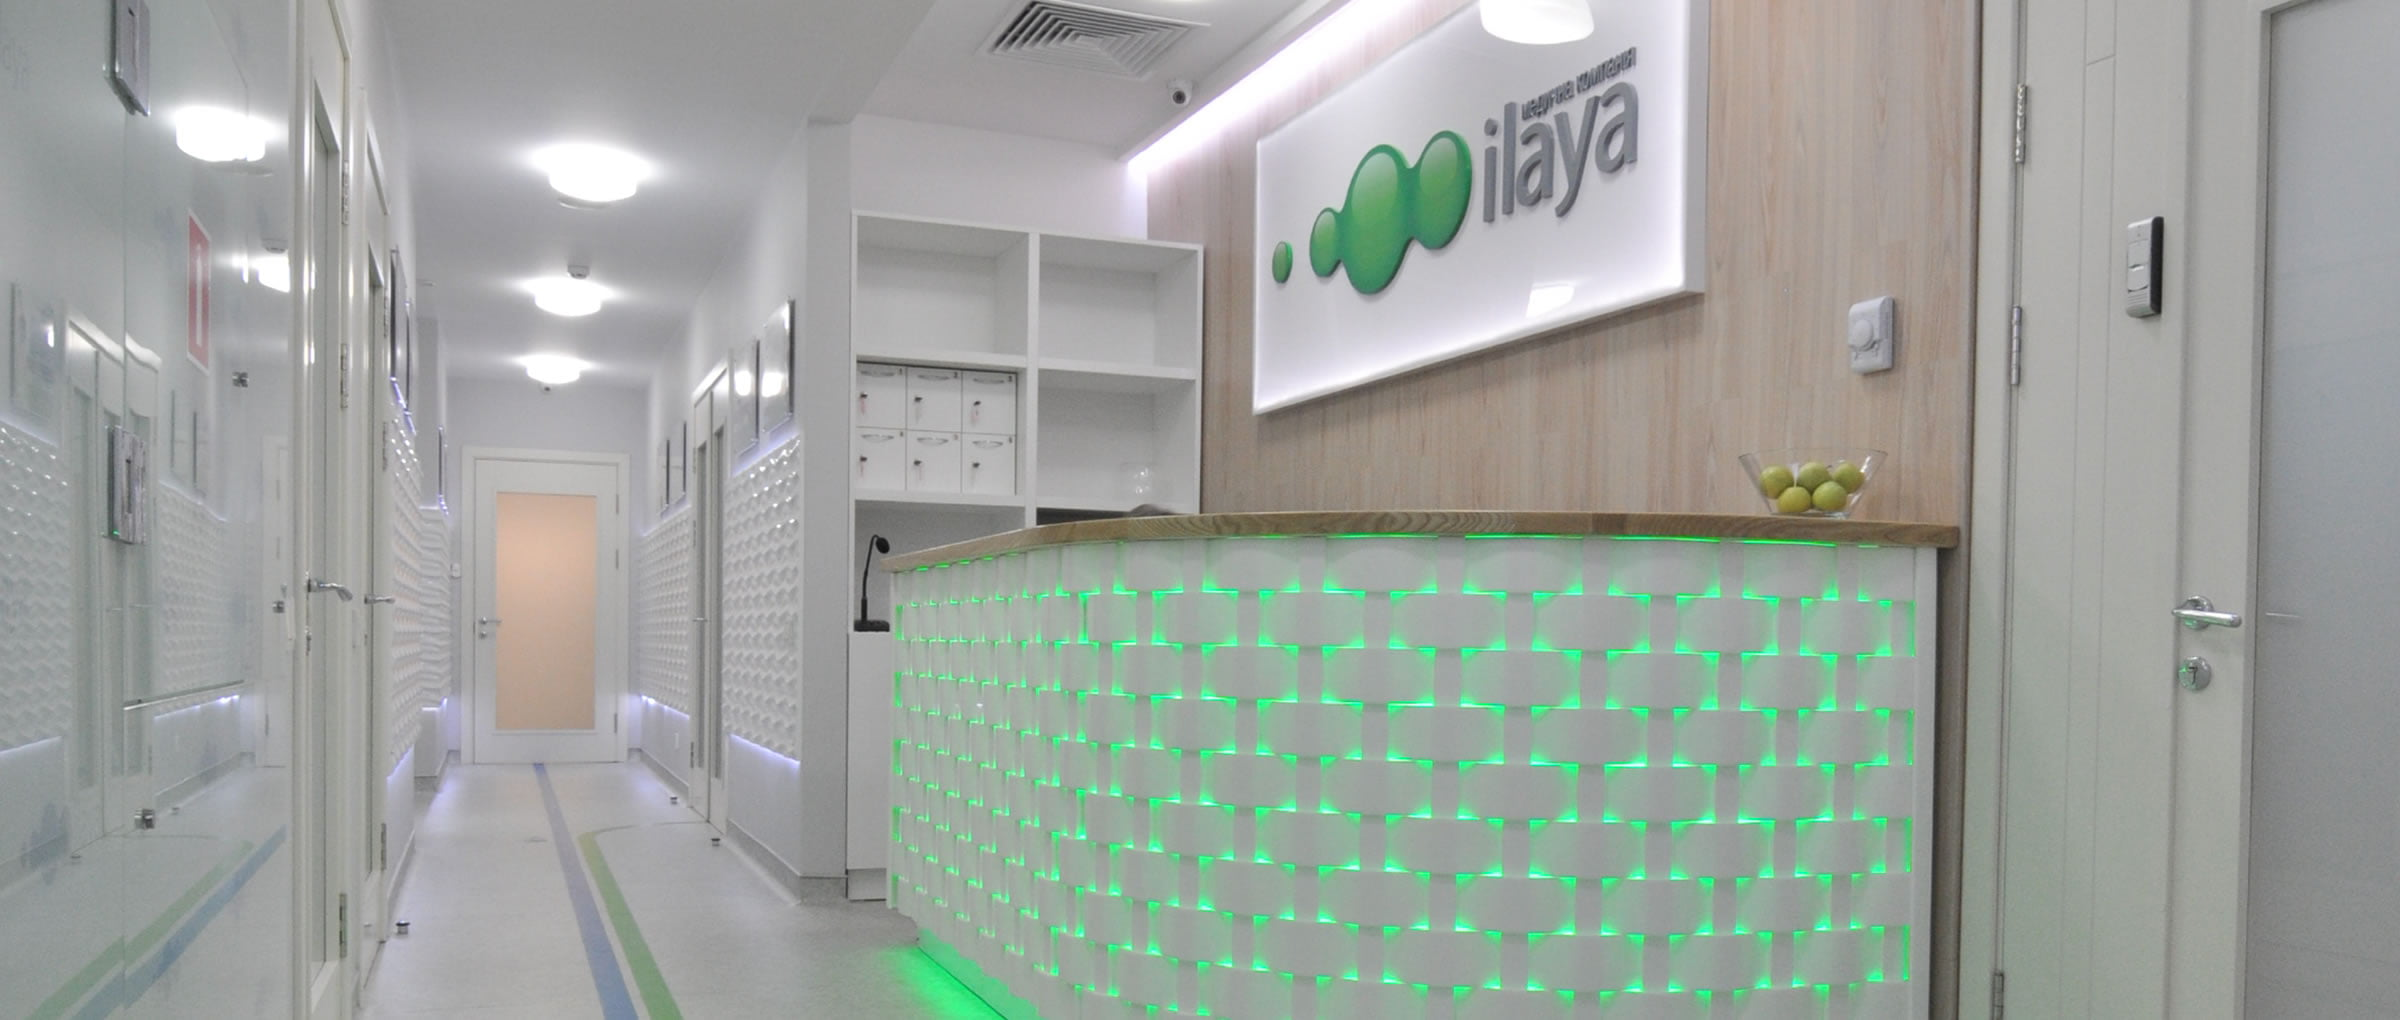 ilaya reception